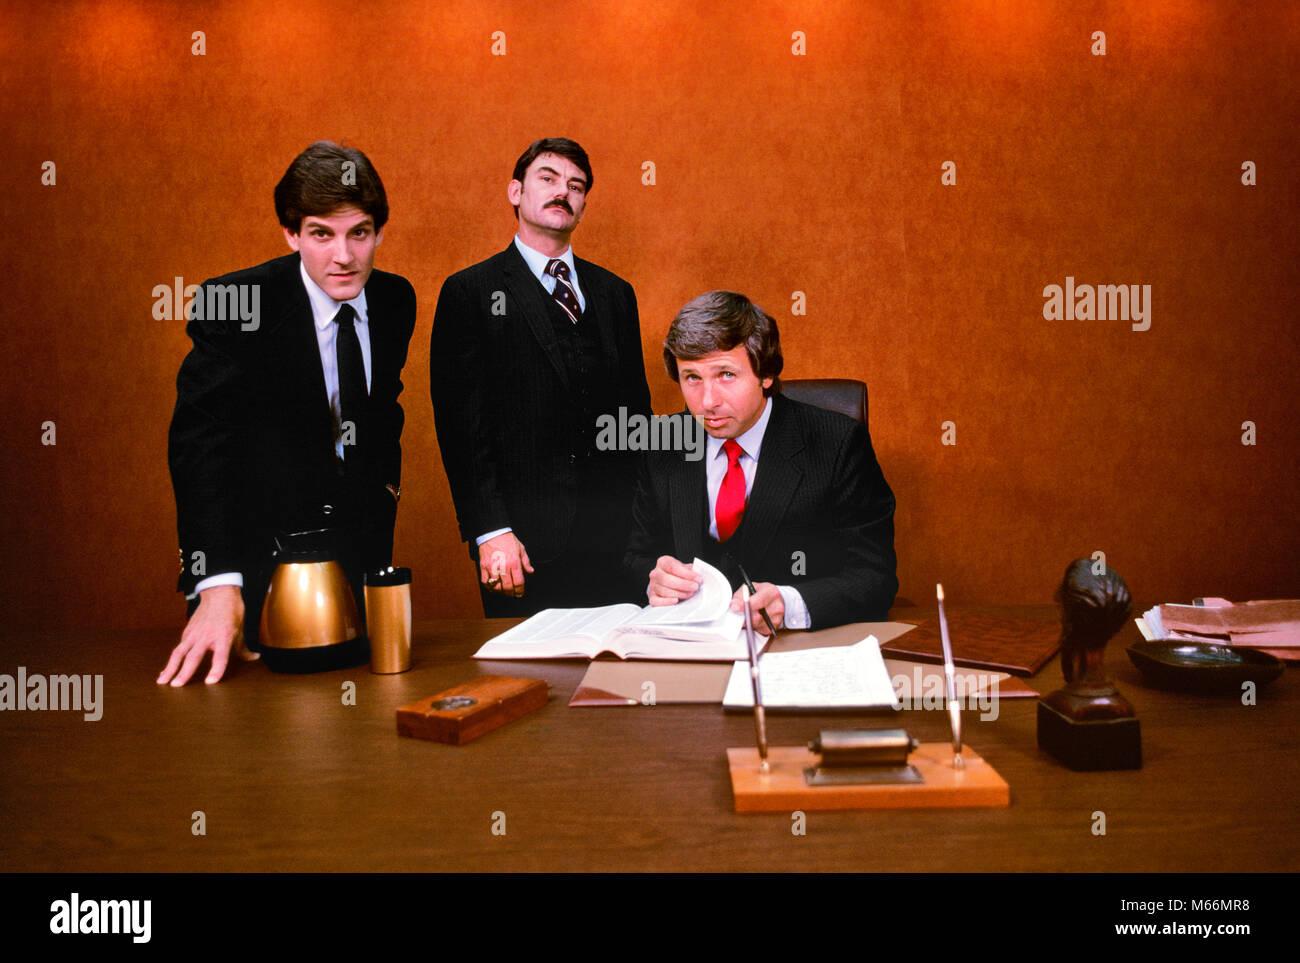 1980s THREE SHARP AGGRESSIVE BUSINESS EXECUTIVES LOOKING AT CAMERA - ko1559 SMT001 HARS 25-30 YEARS 30-35 YEARS - Stock Image